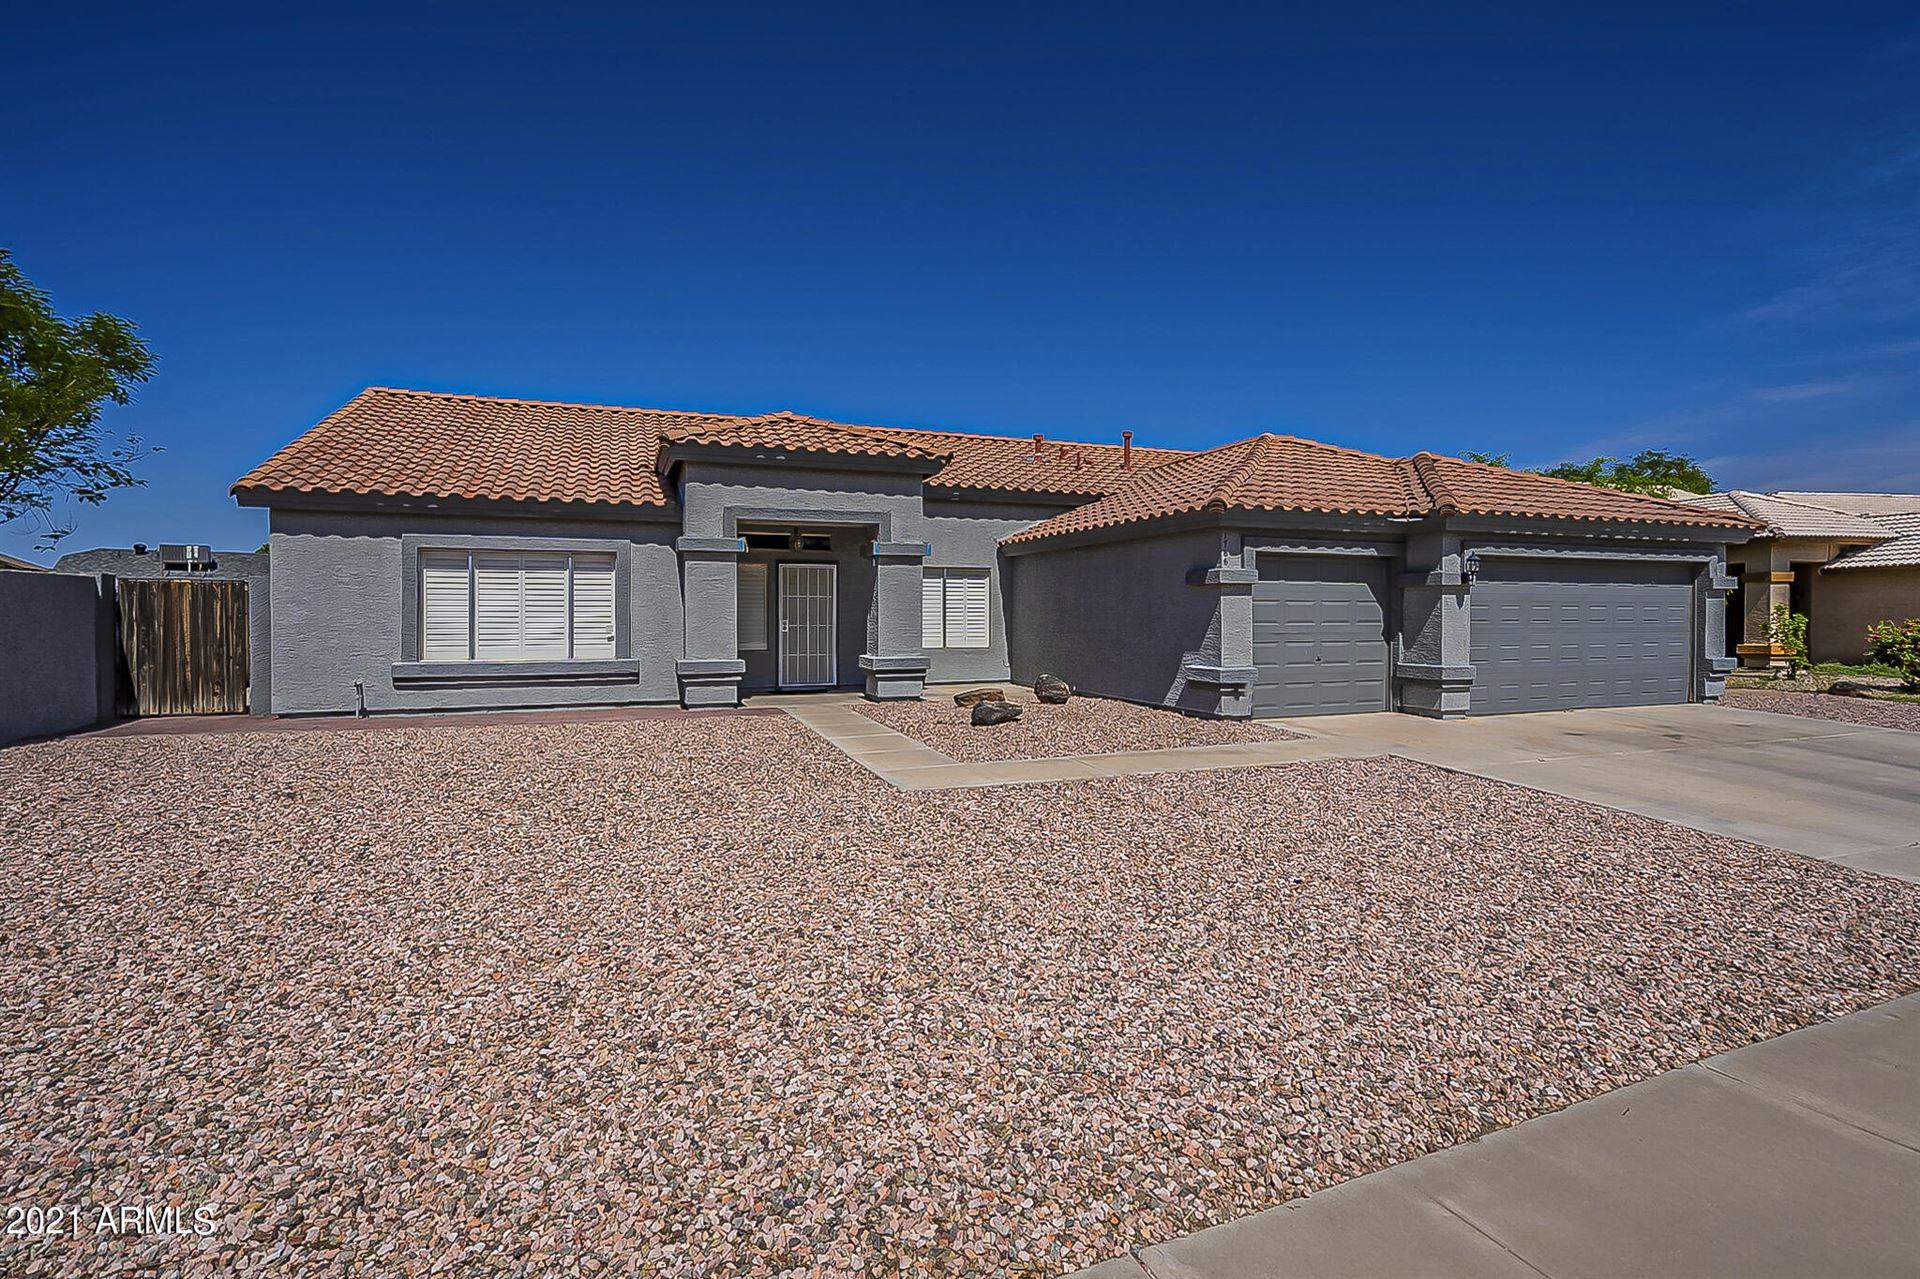 1766 E FREMONT Road, Phoenix, AZ 85042 - MLS#: 6299453